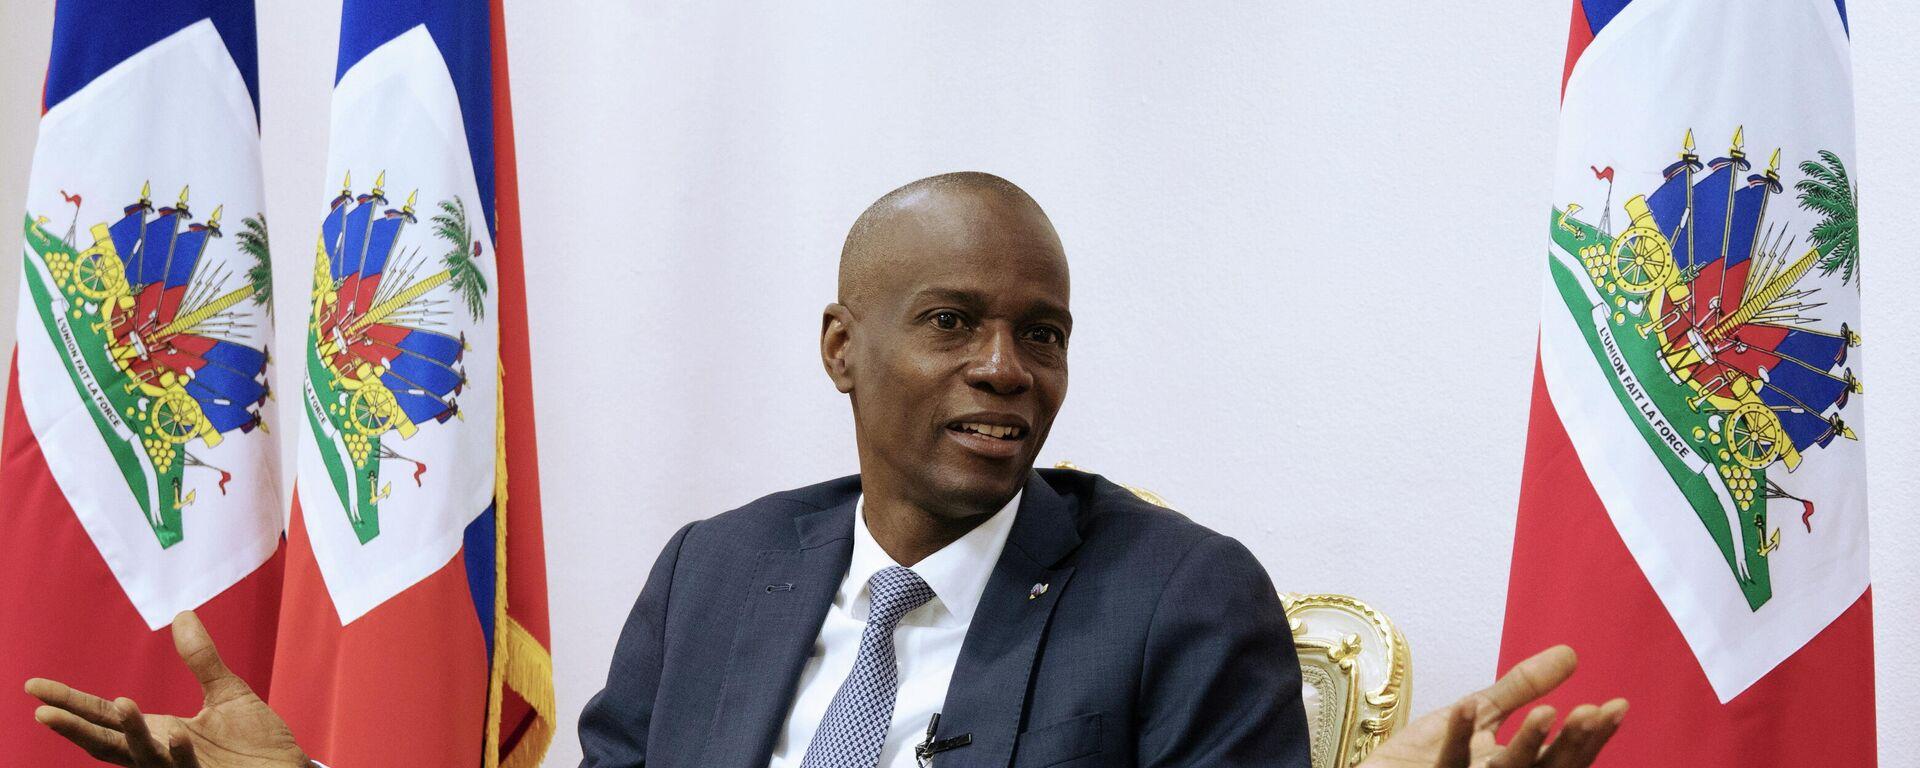 Der Präsident von Haiti Jovenel Moïse (Archivbild) - SNA, 1920, 16.07.2021